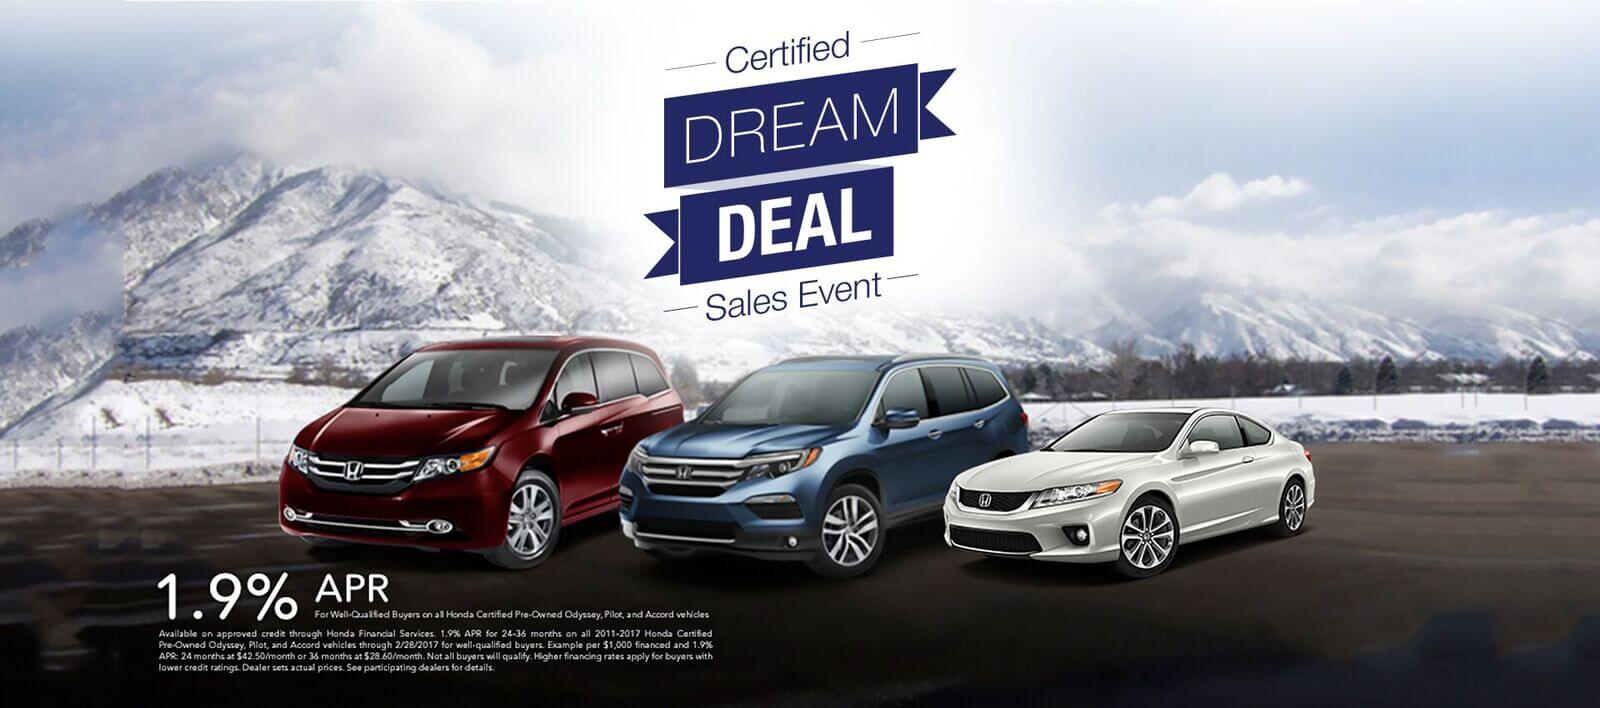 Dream Deal Sale